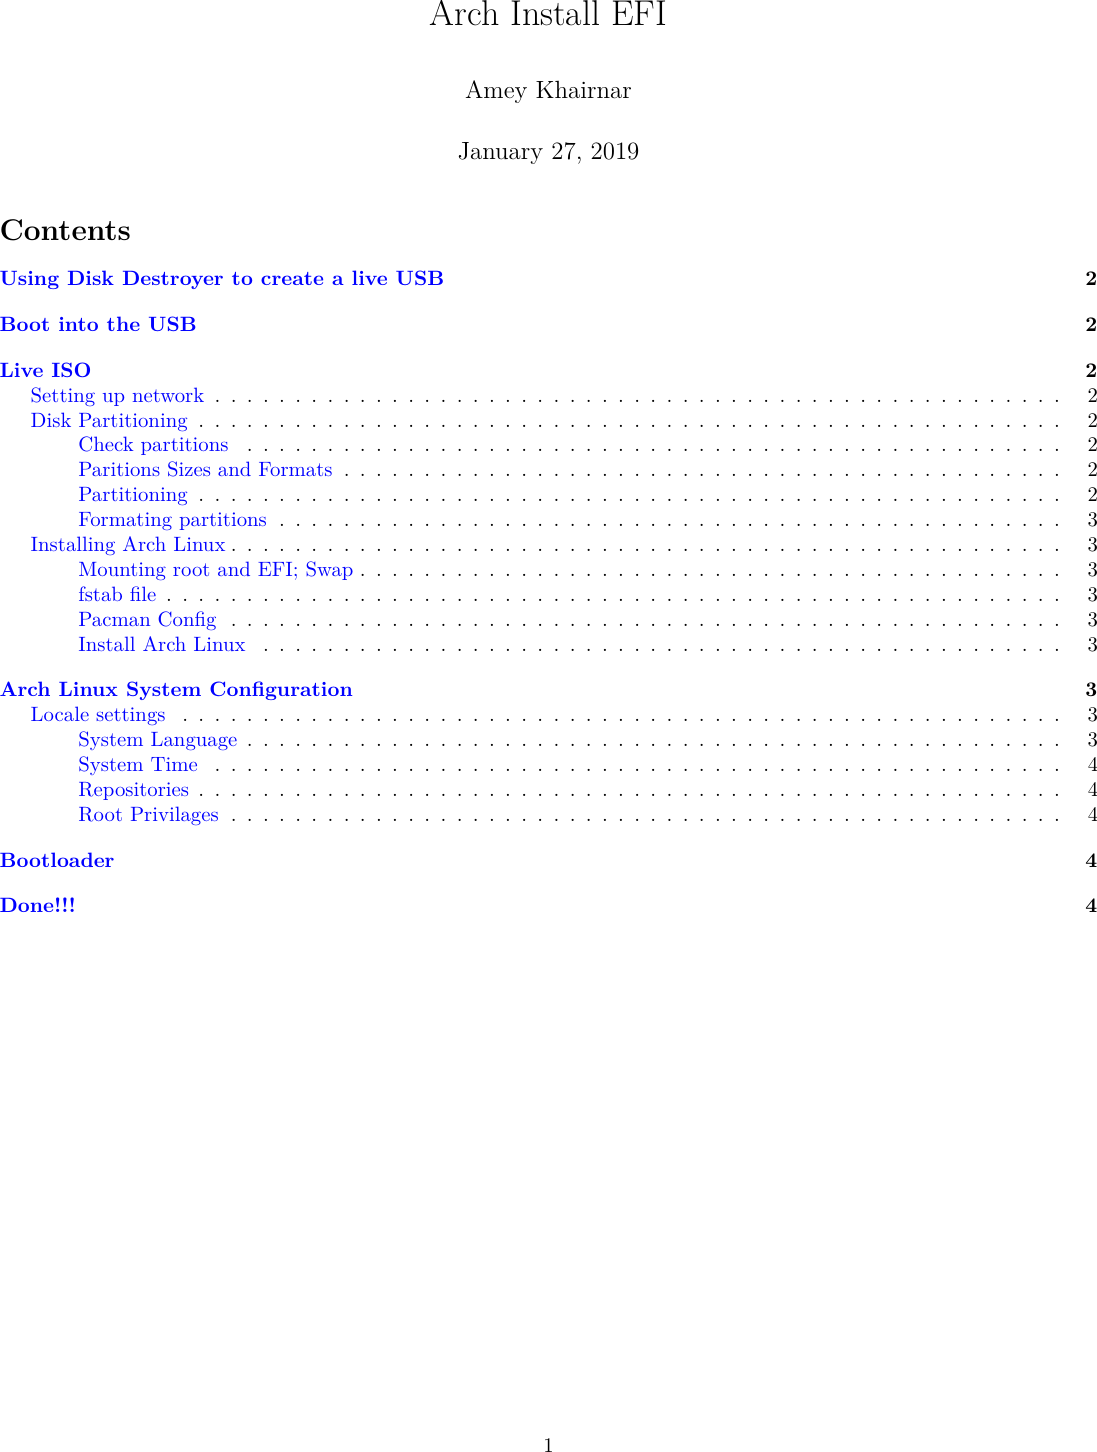 Arch Install EFI Guide